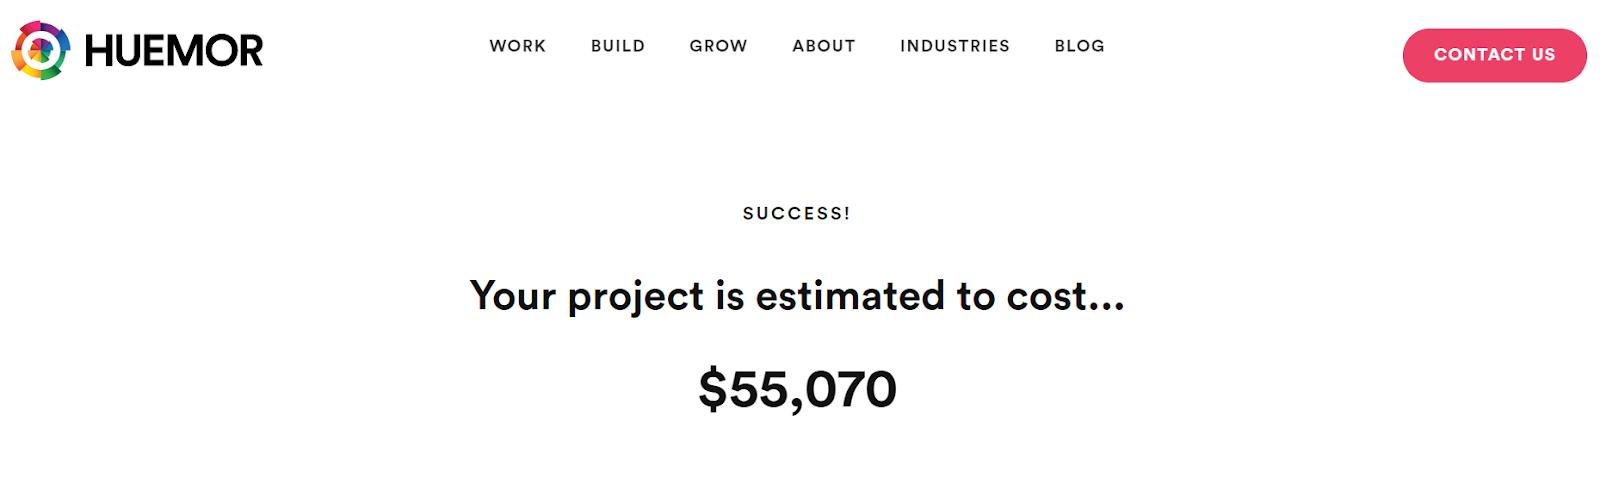 huemor project cost